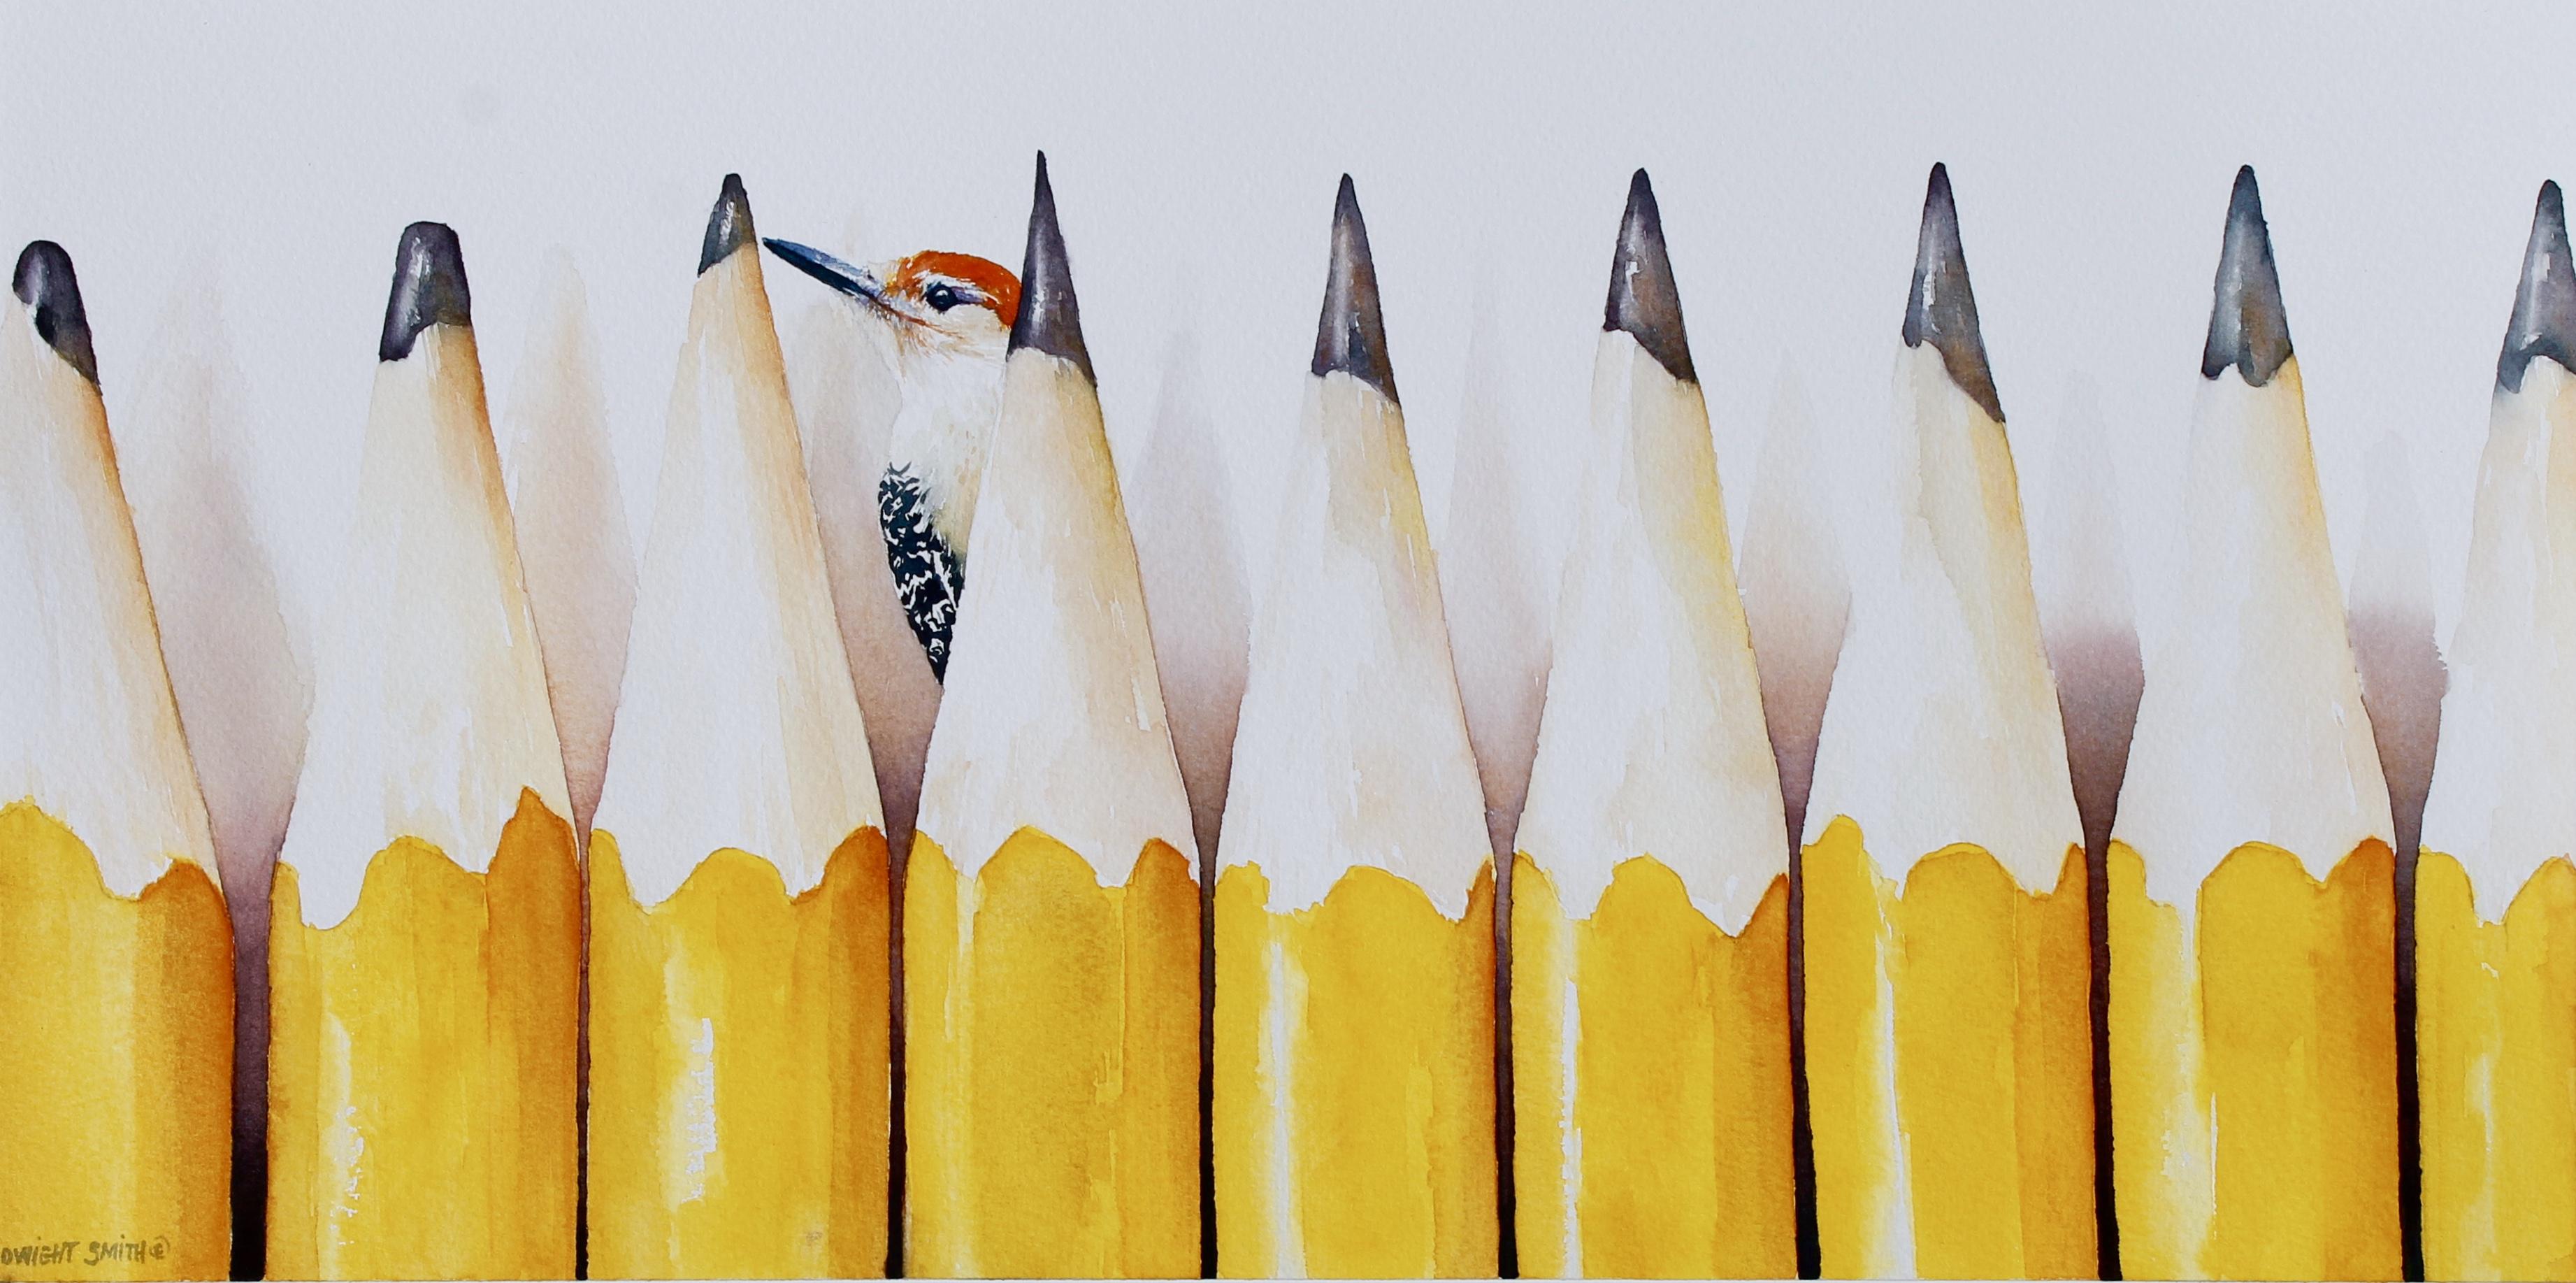 """ The Pencil Sharpener """